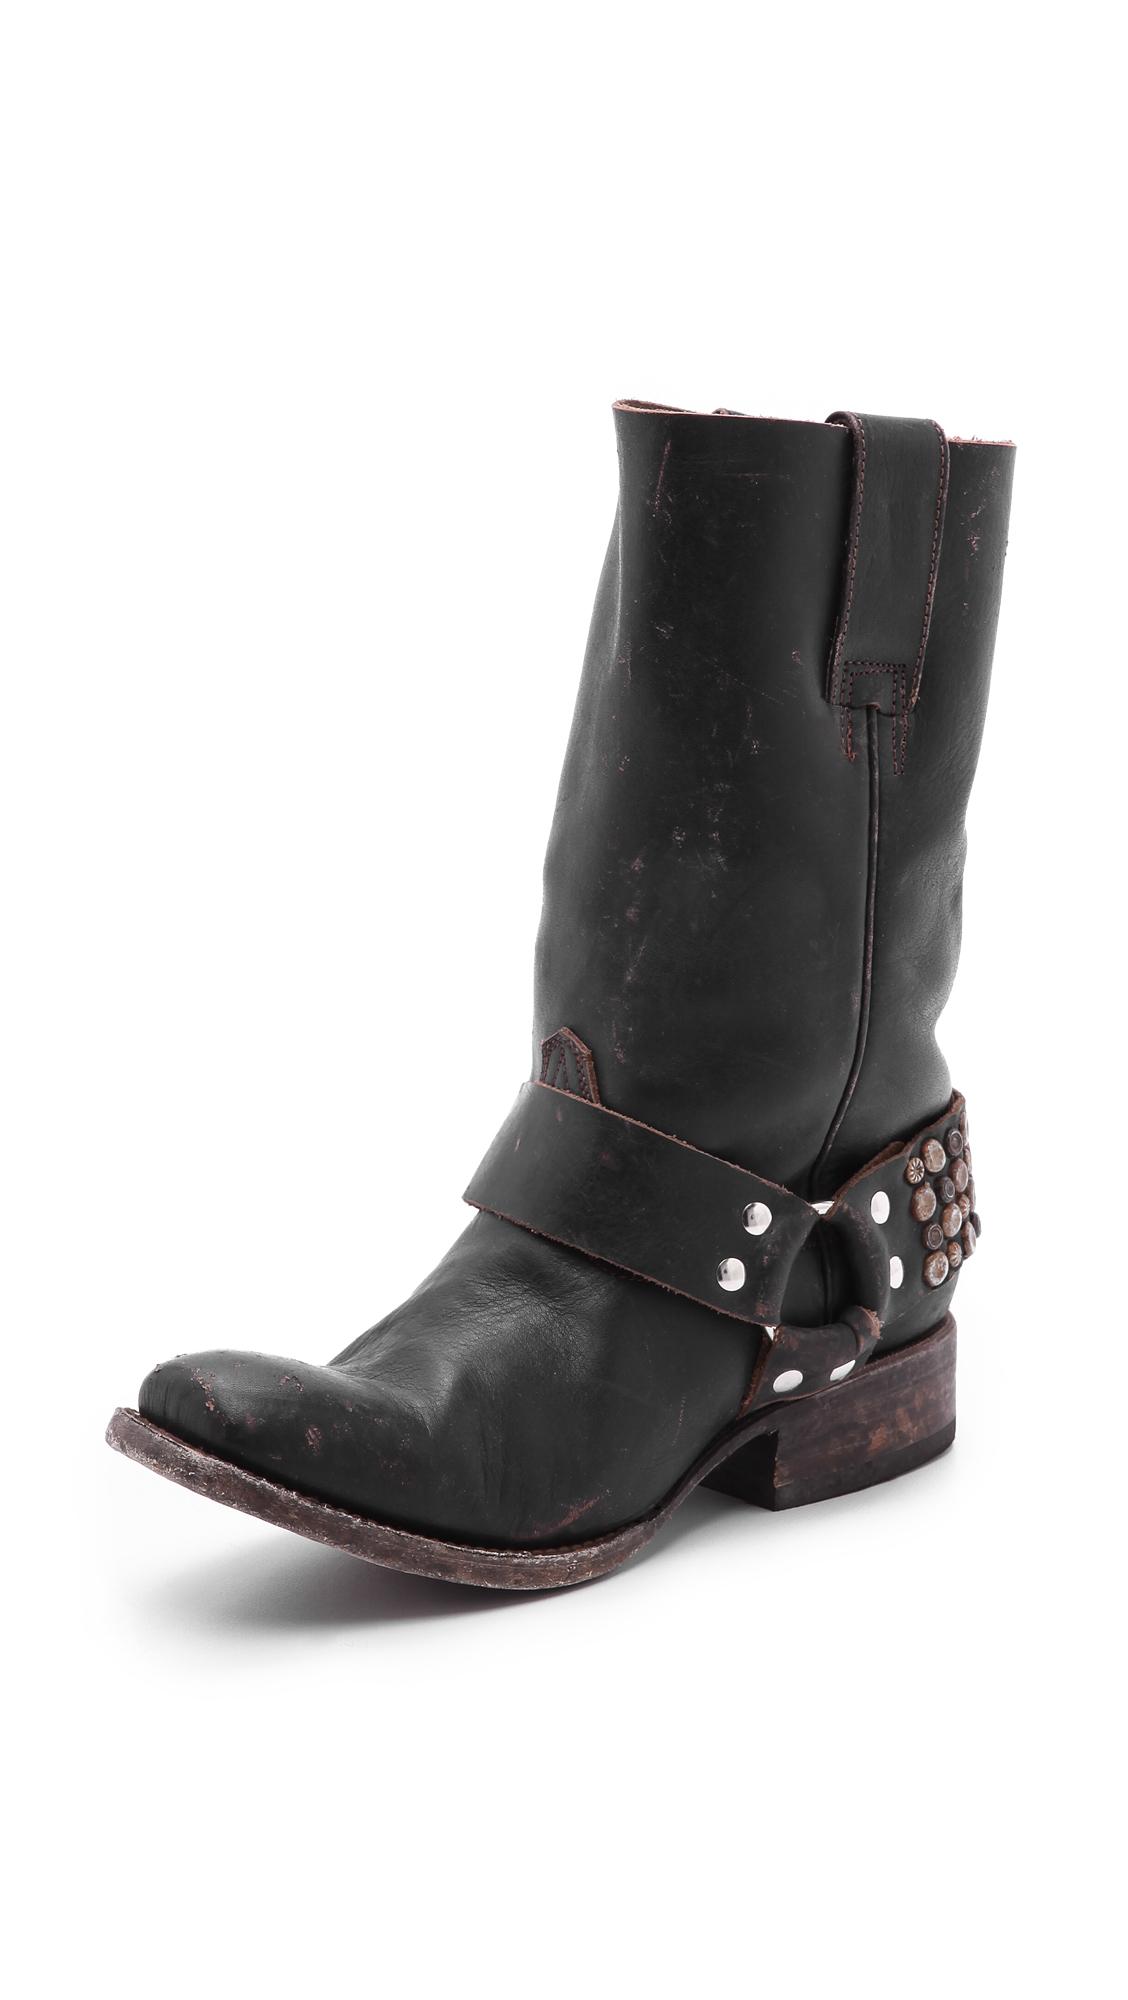 Freebird By Steven Thompson Studded Moto Boots In Black Lyst